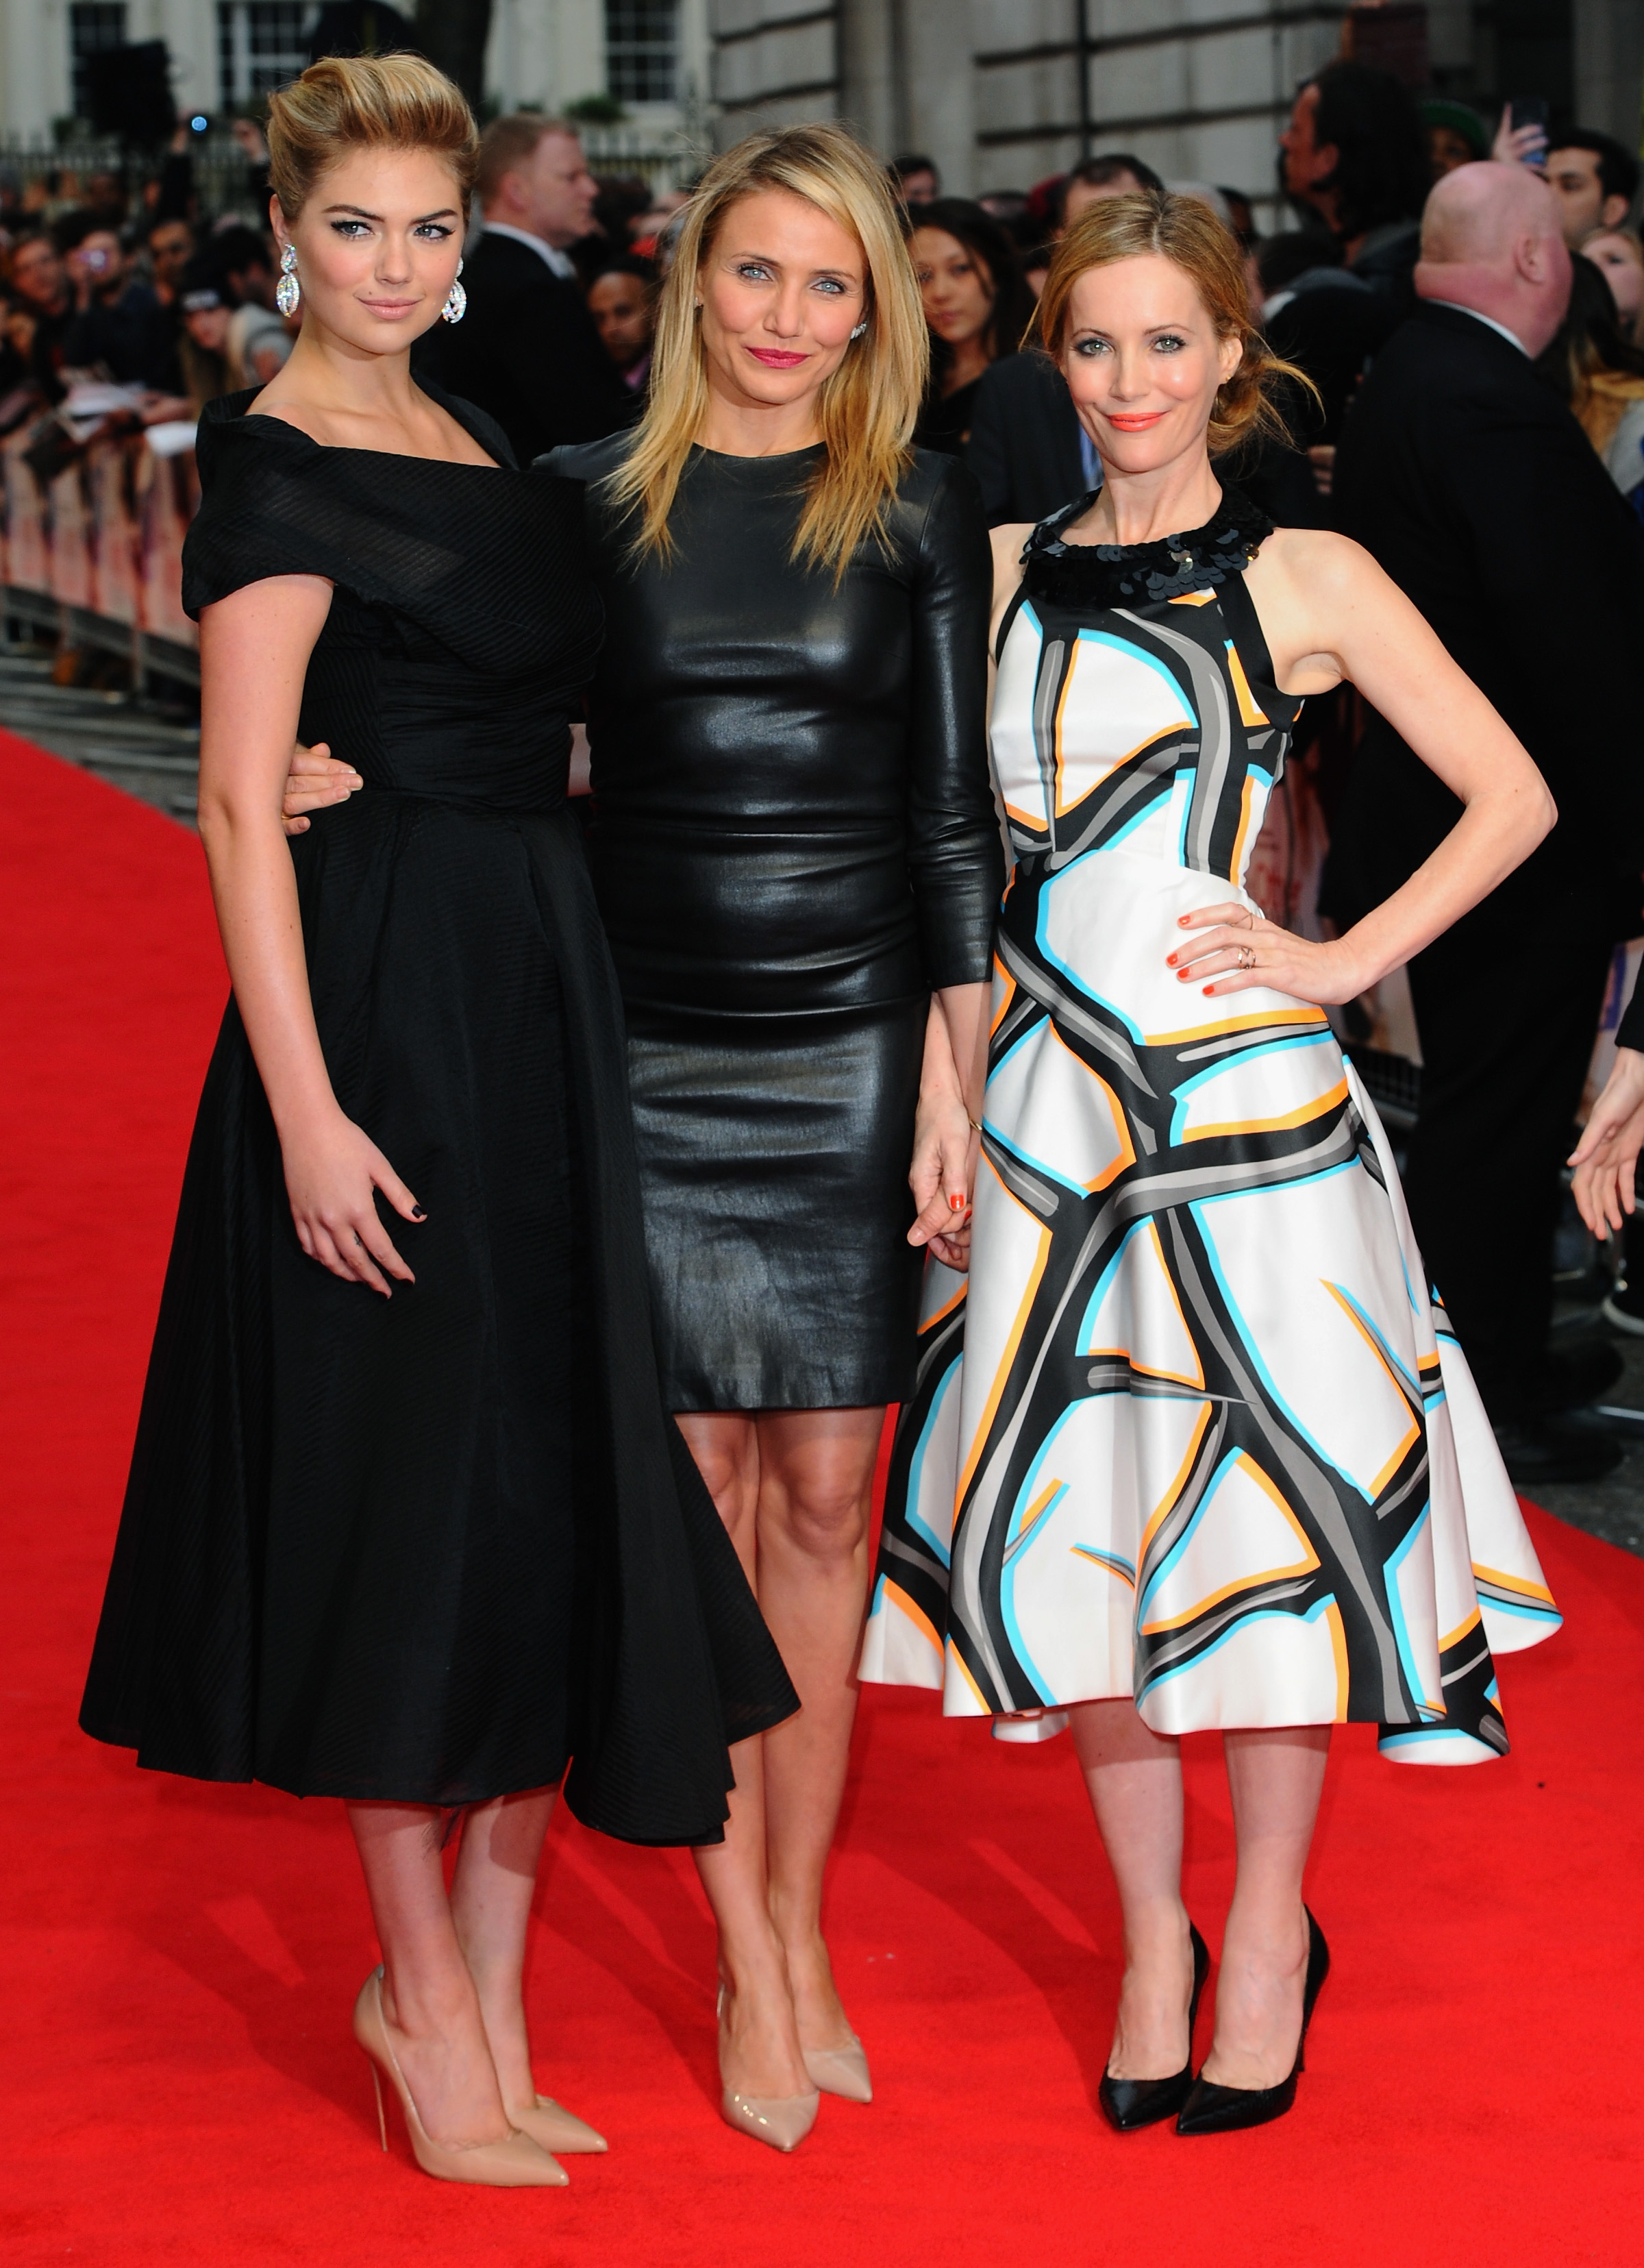 Cameron Vs Kate Vs Leslie Best Dressed Other Woman